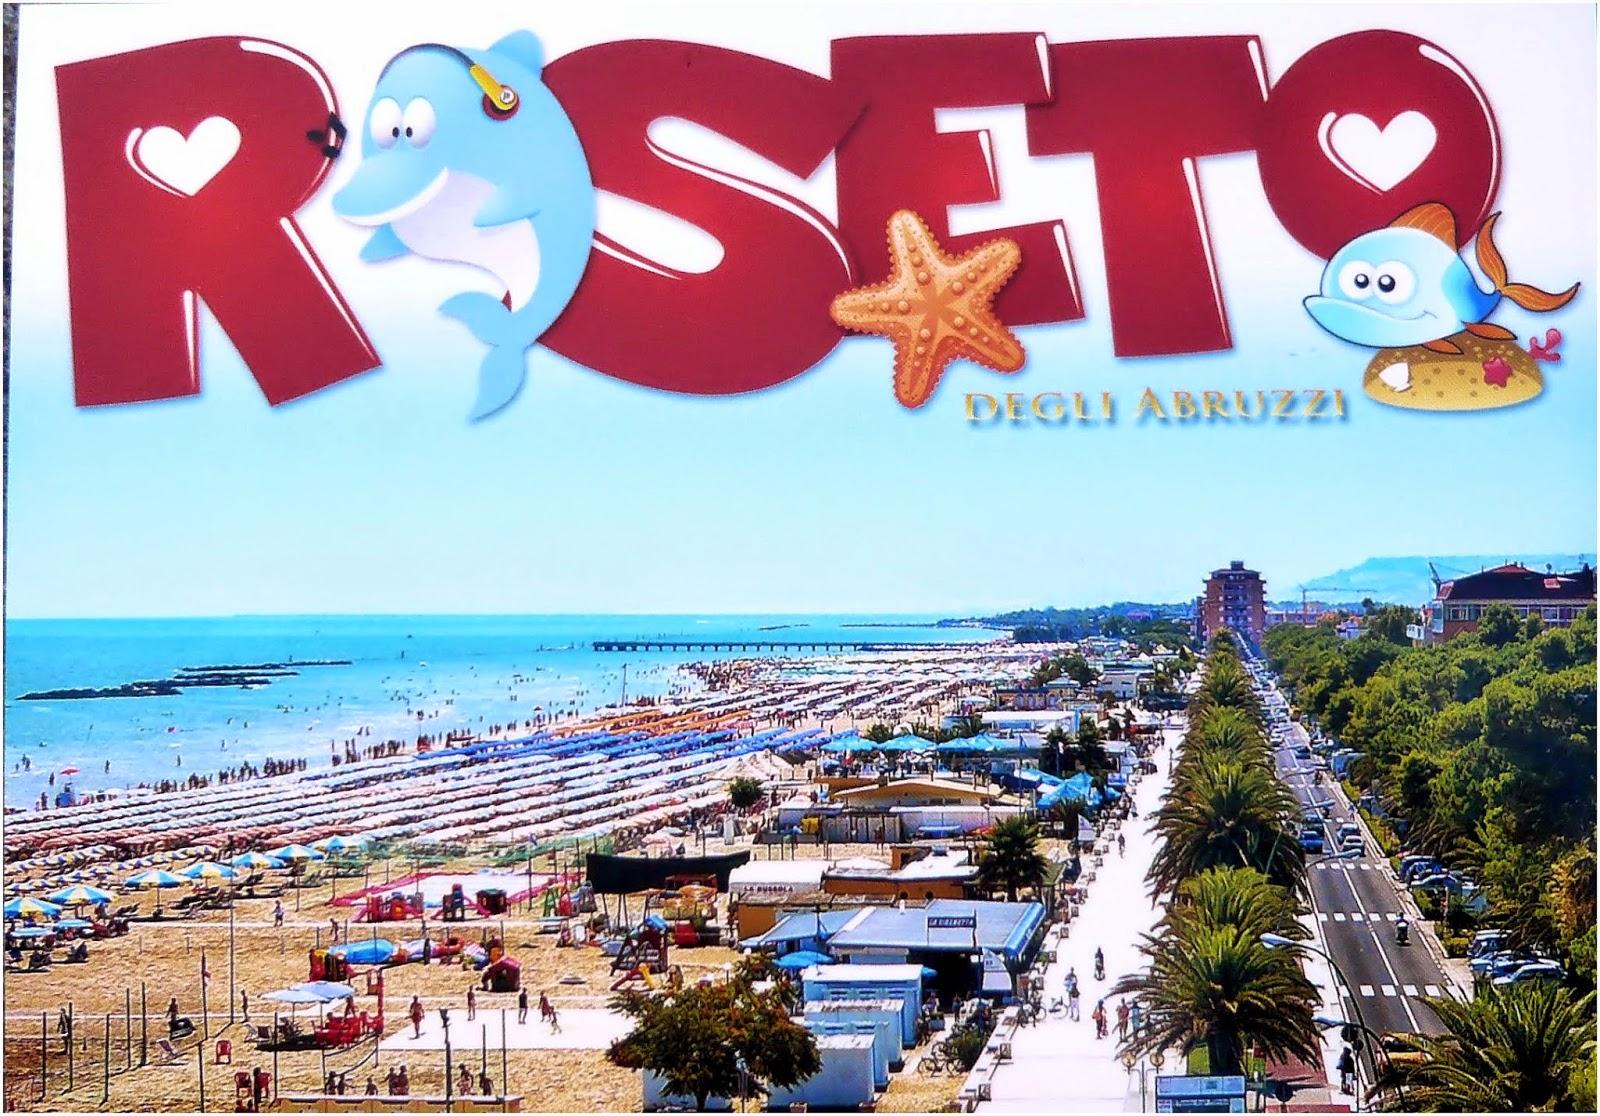 degli abbruzzi, roseto, it, mare, zee, beach , mer,